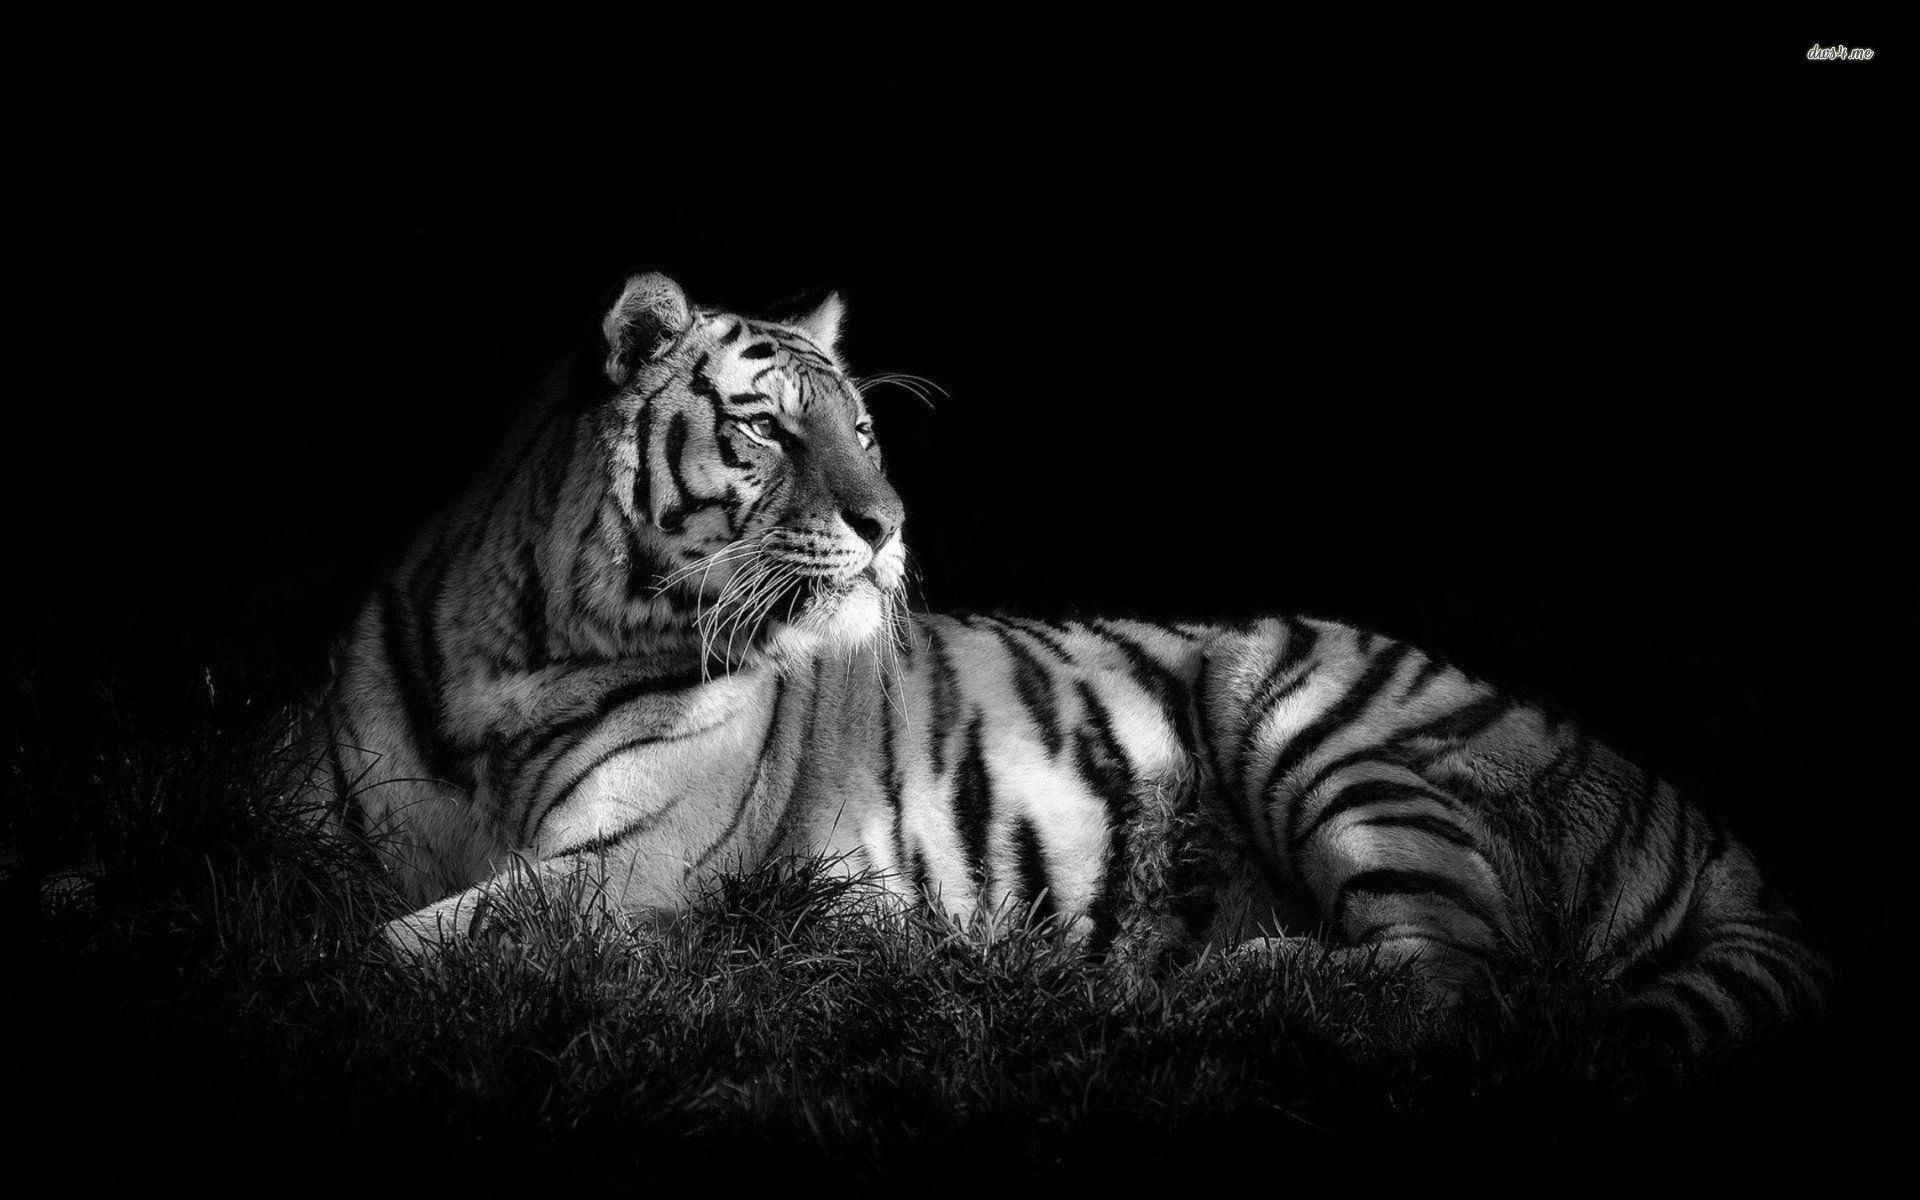 tiger in black & white   pc wallpaper black-and-white-tiger hd in